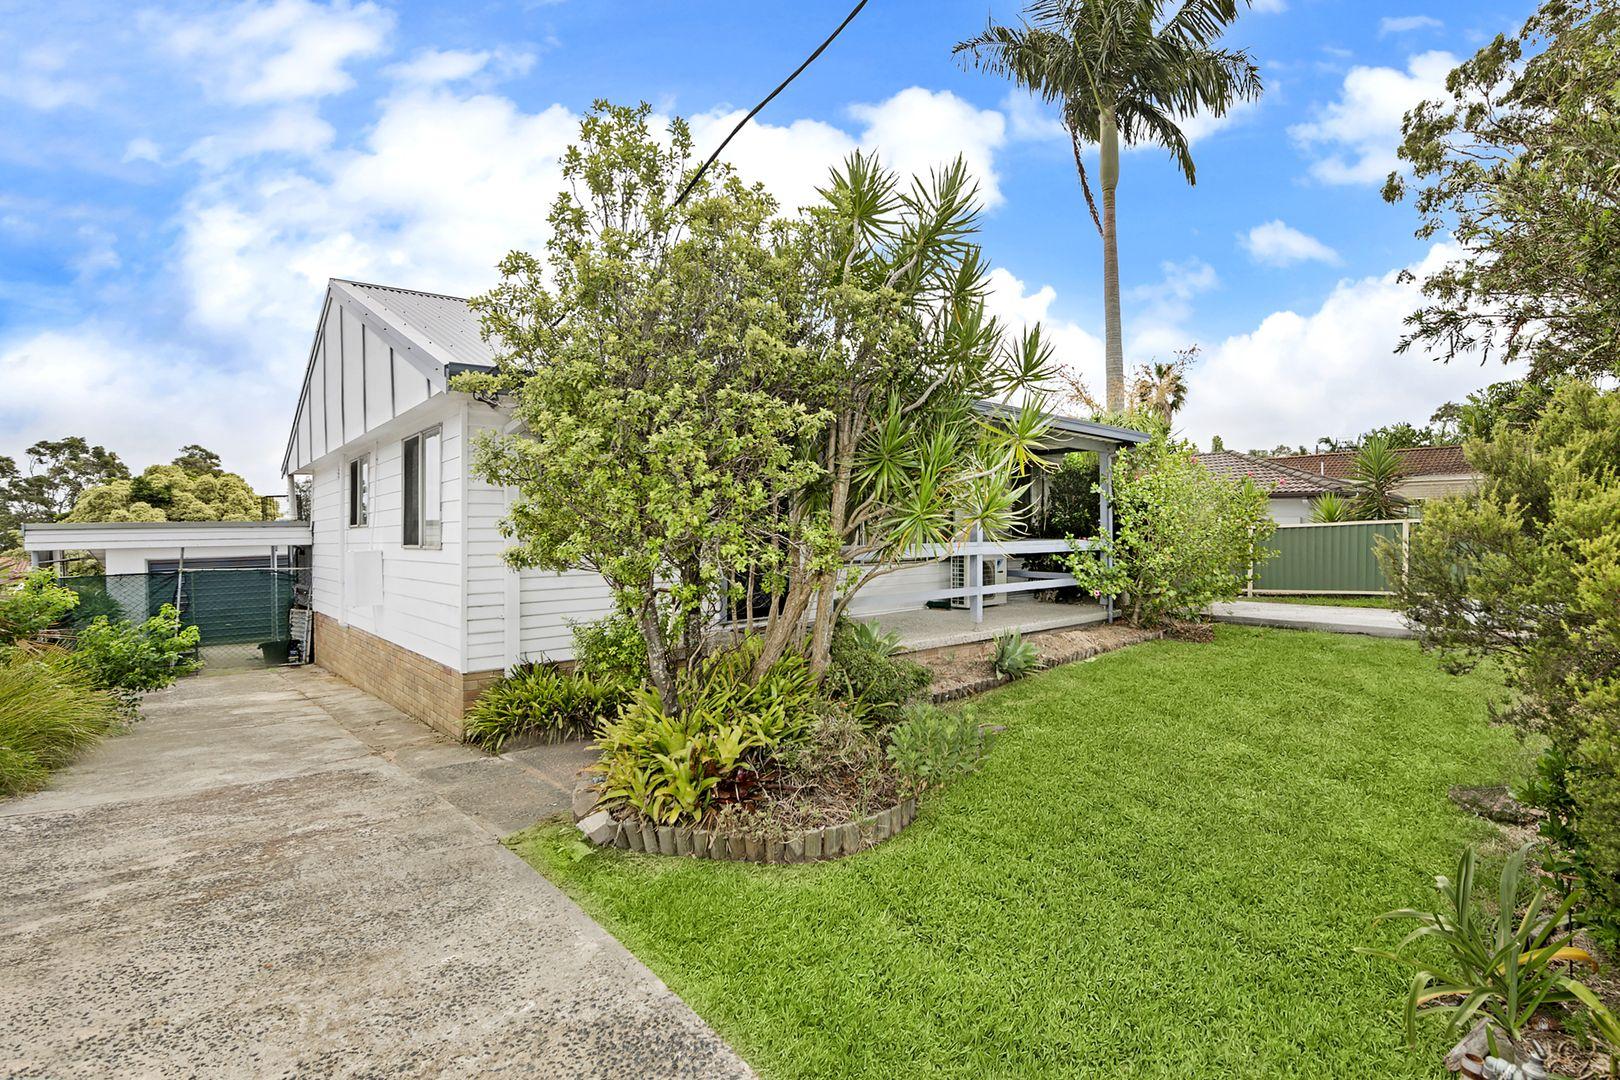 54 Springall Avenue, Wyongah NSW 2259, Image 1